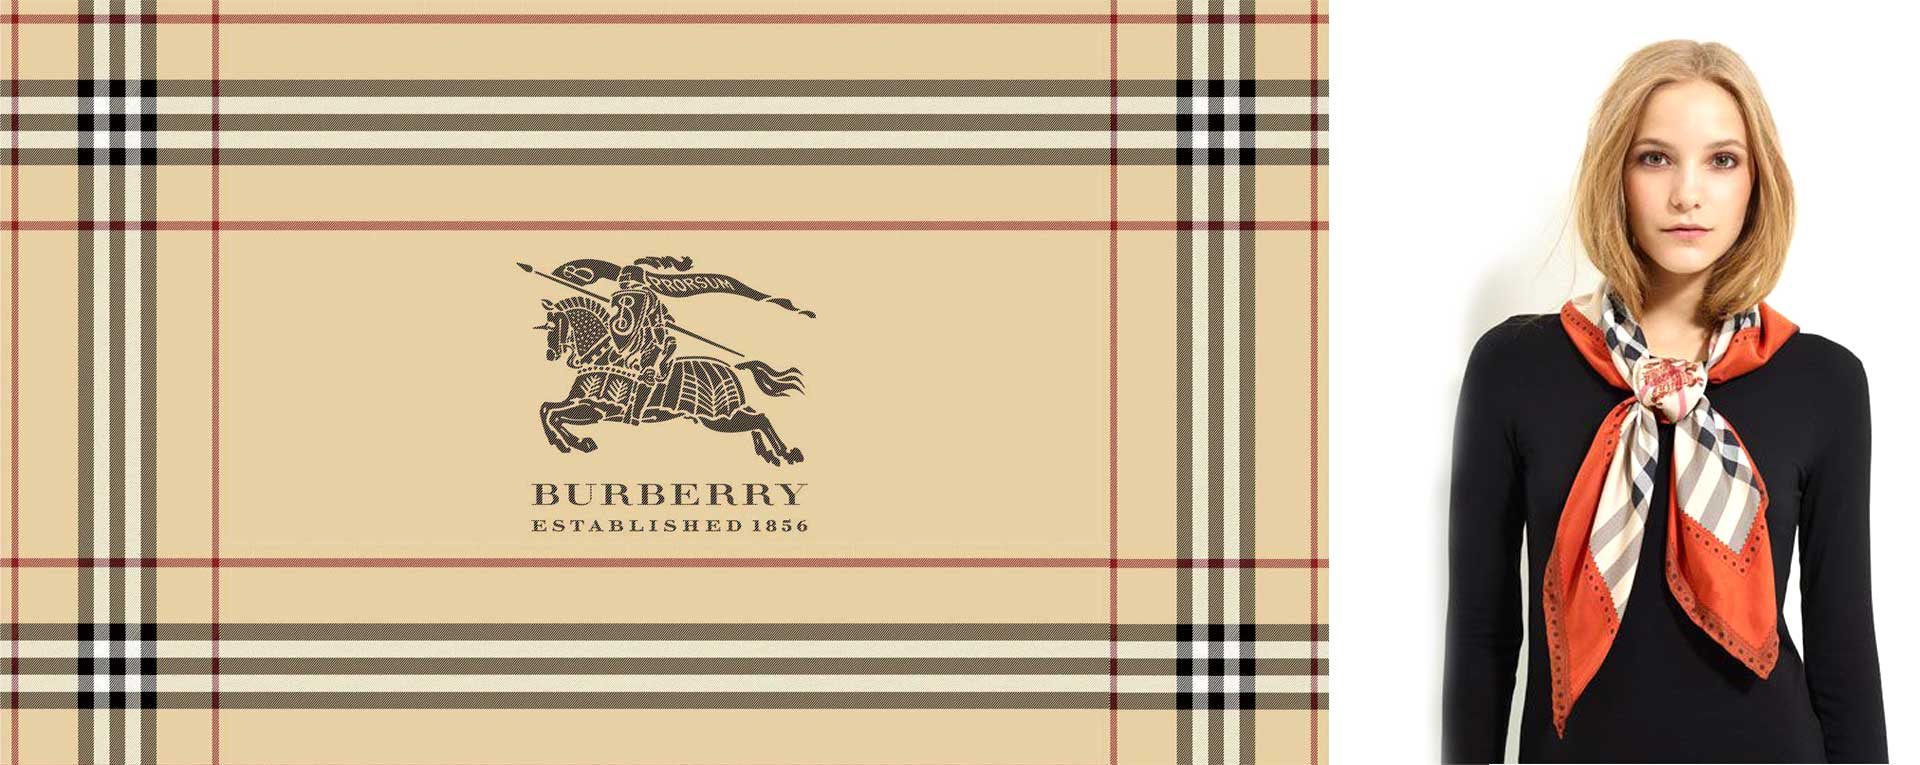 burberry 2 1 - برند بربری